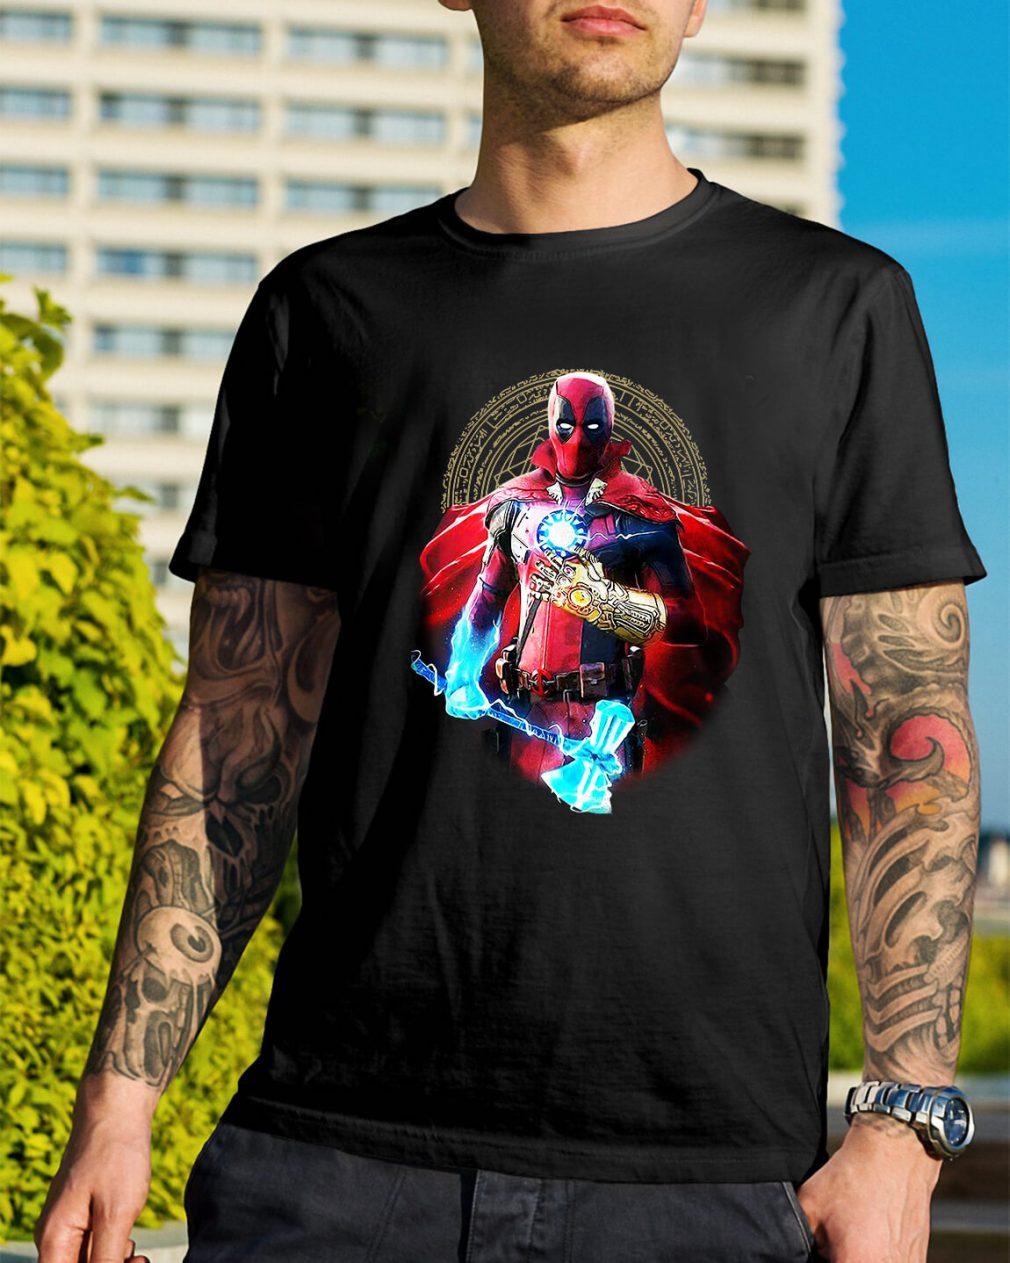 Avengers Infinity Deadpool shirt